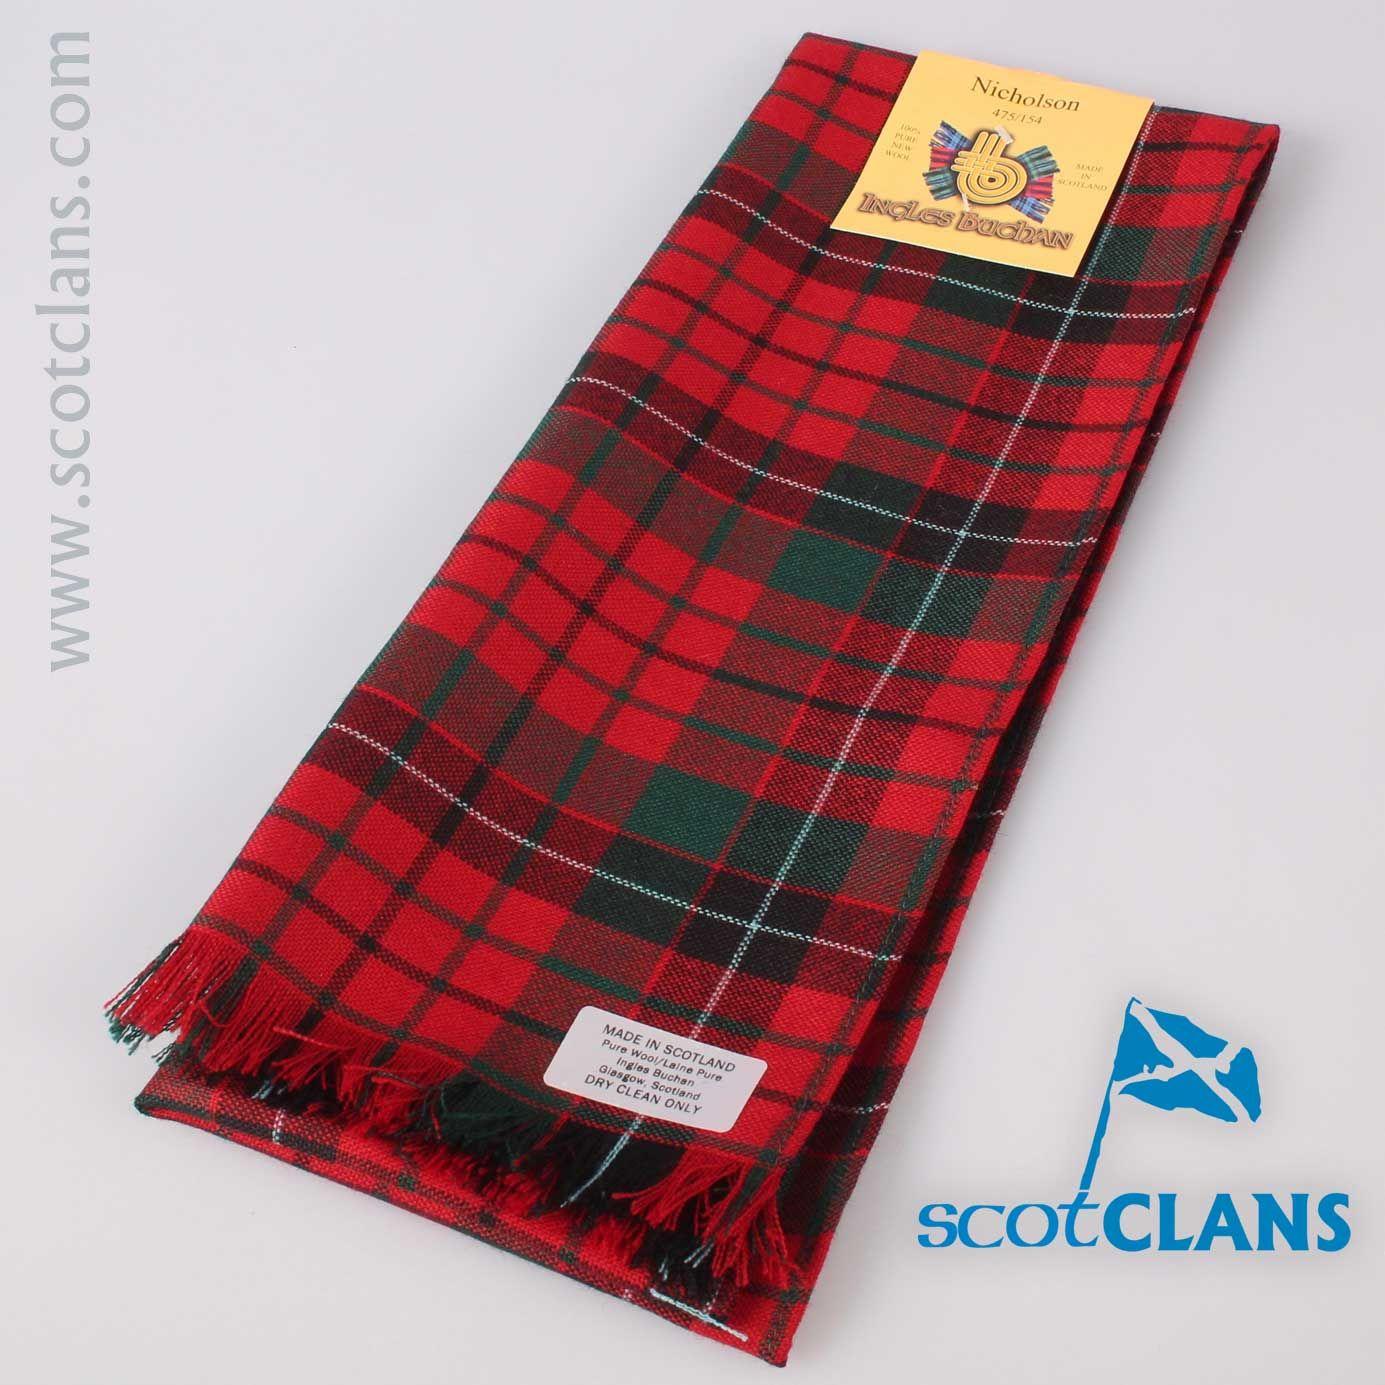 Nicholson Tartan Scarf | Nicolson clan | Pinterest | Tartan and Scarves